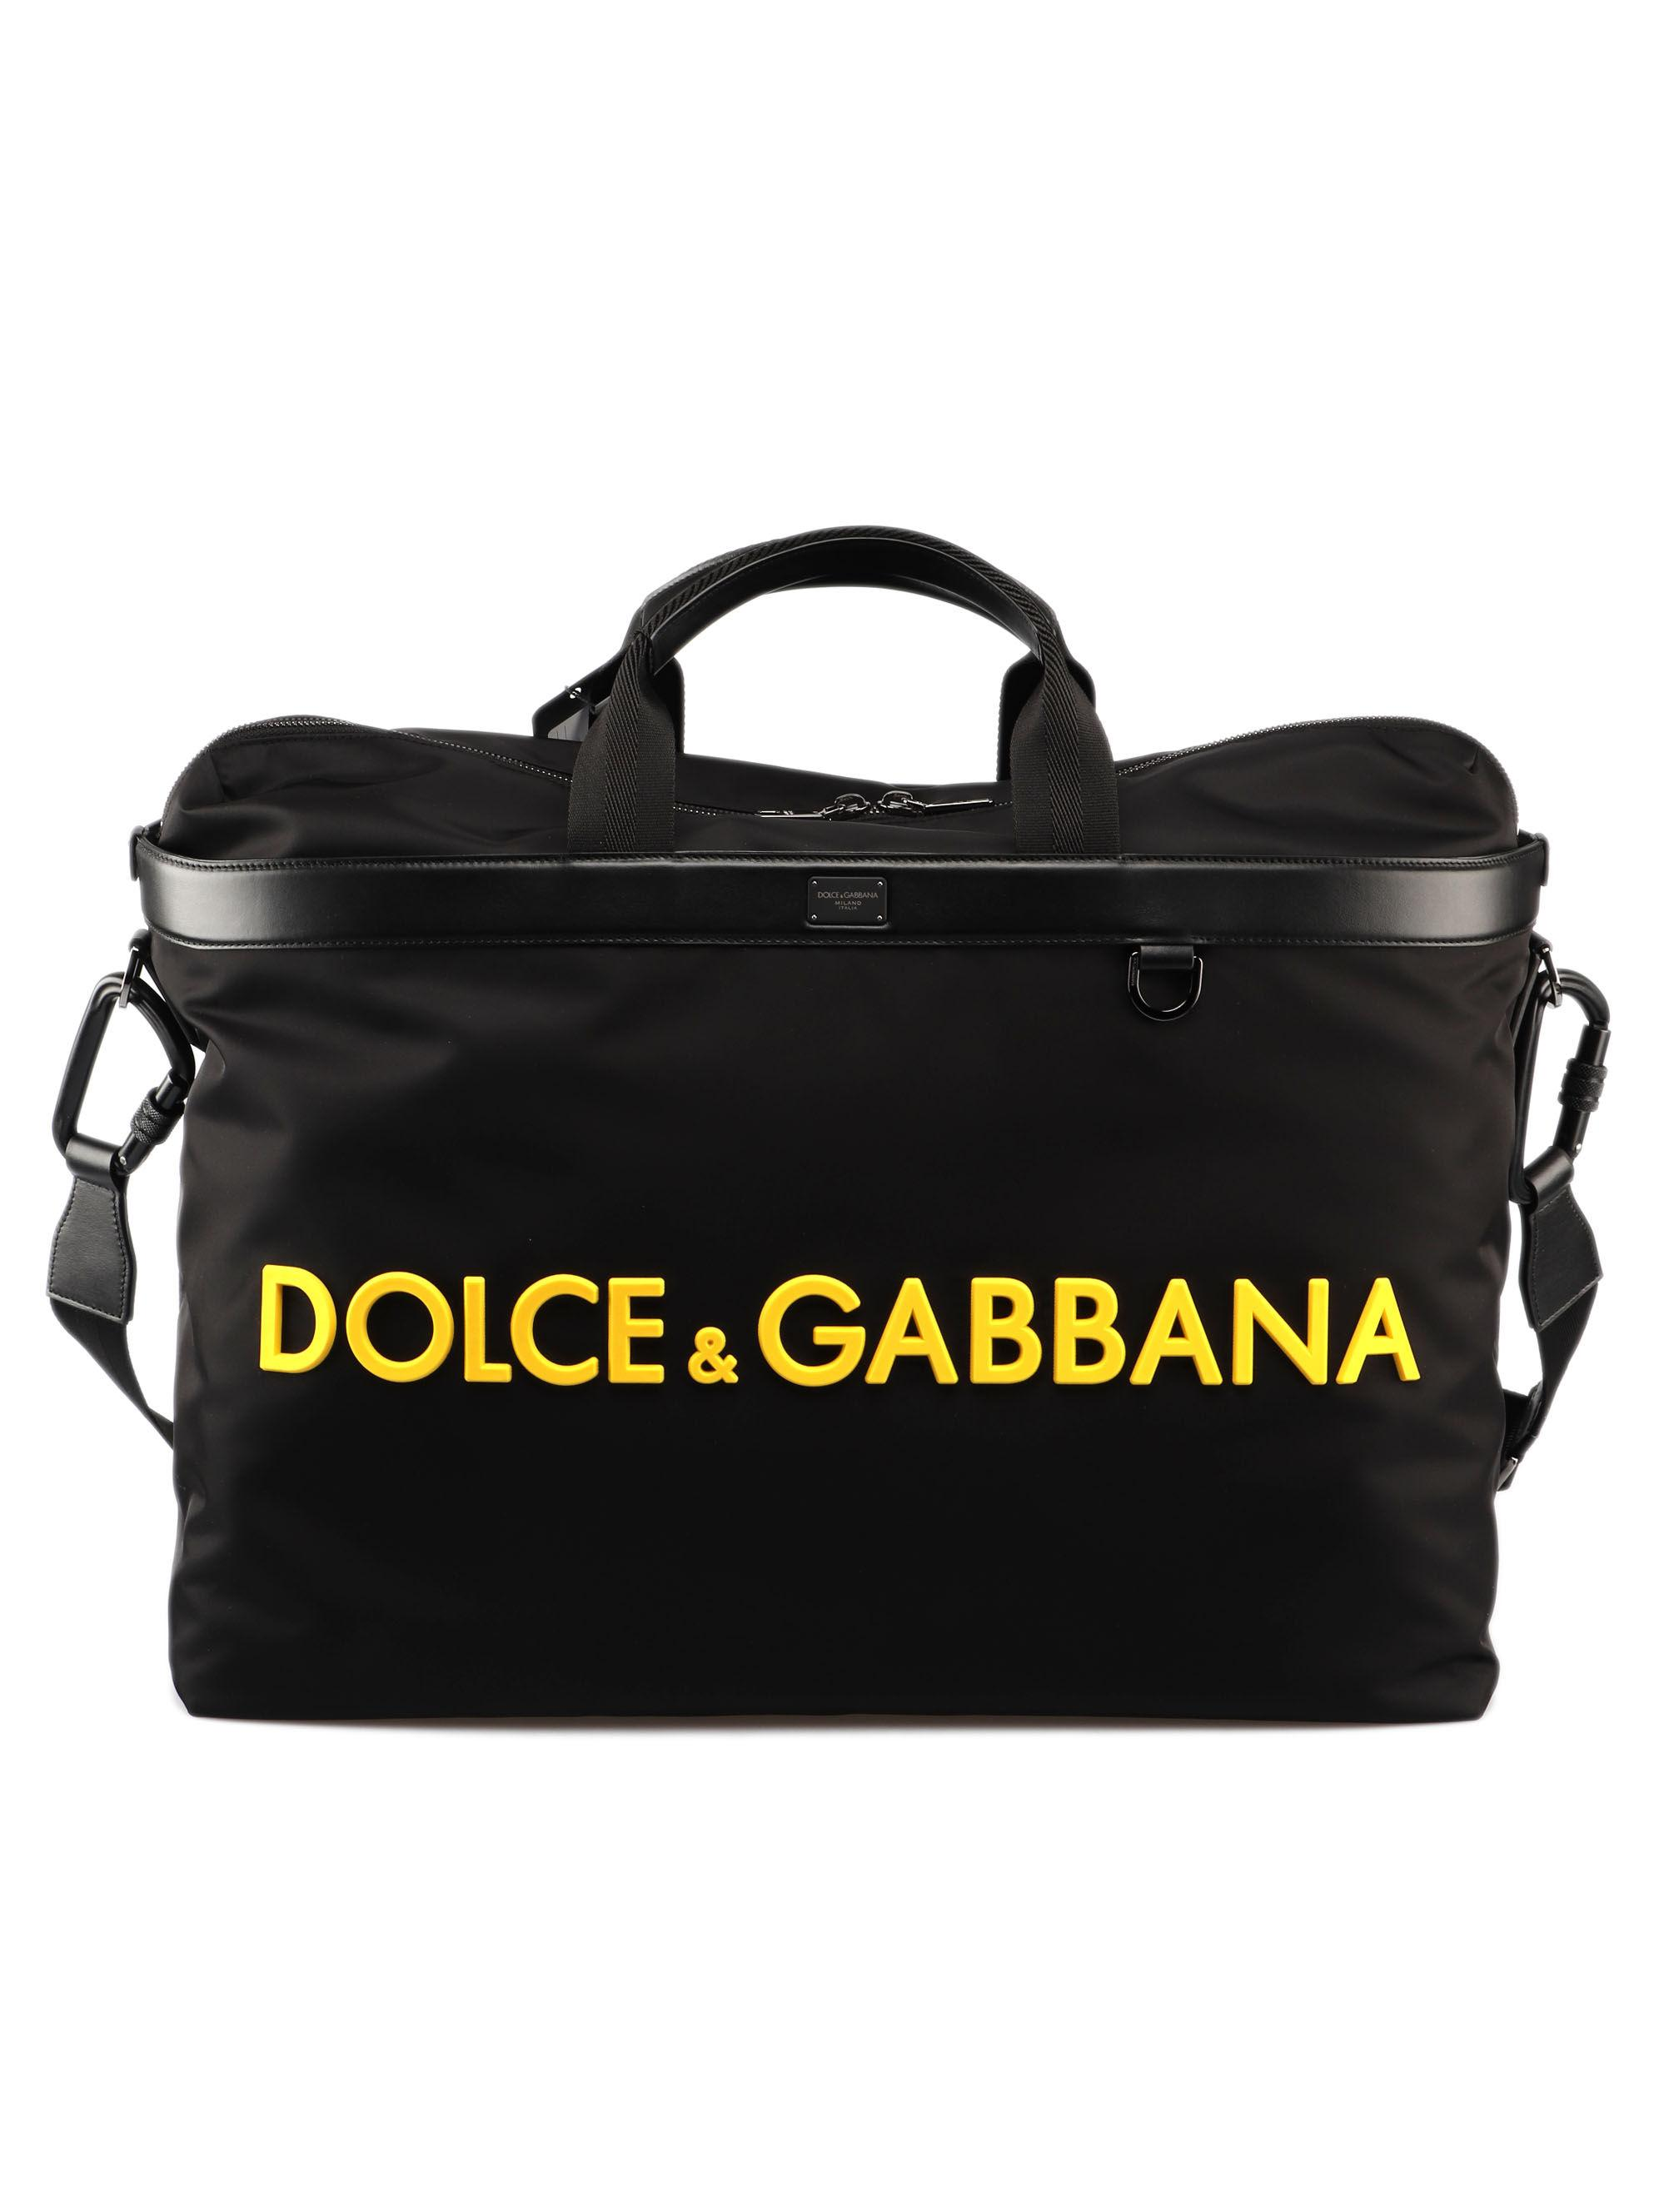 Lyst - Dolce   Gabbana Shopping Nylon+vit.mediterrane in Black for Men f52d034af80c3